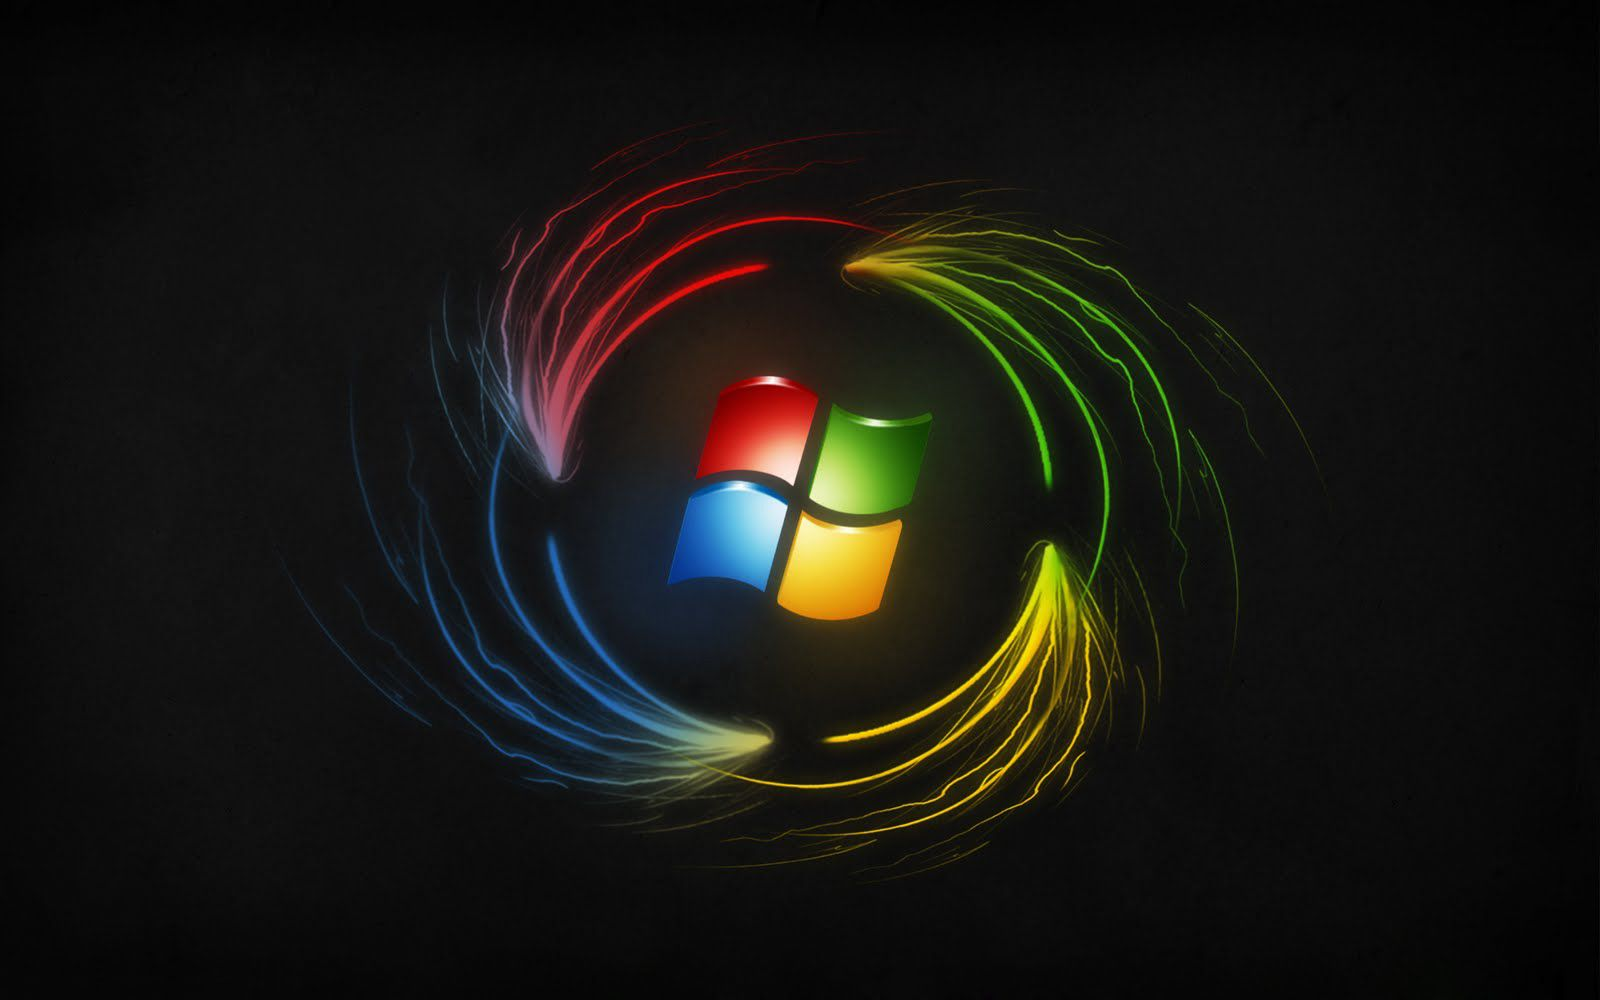 Windows Computer Wallpapers - Top Free Windows Computer